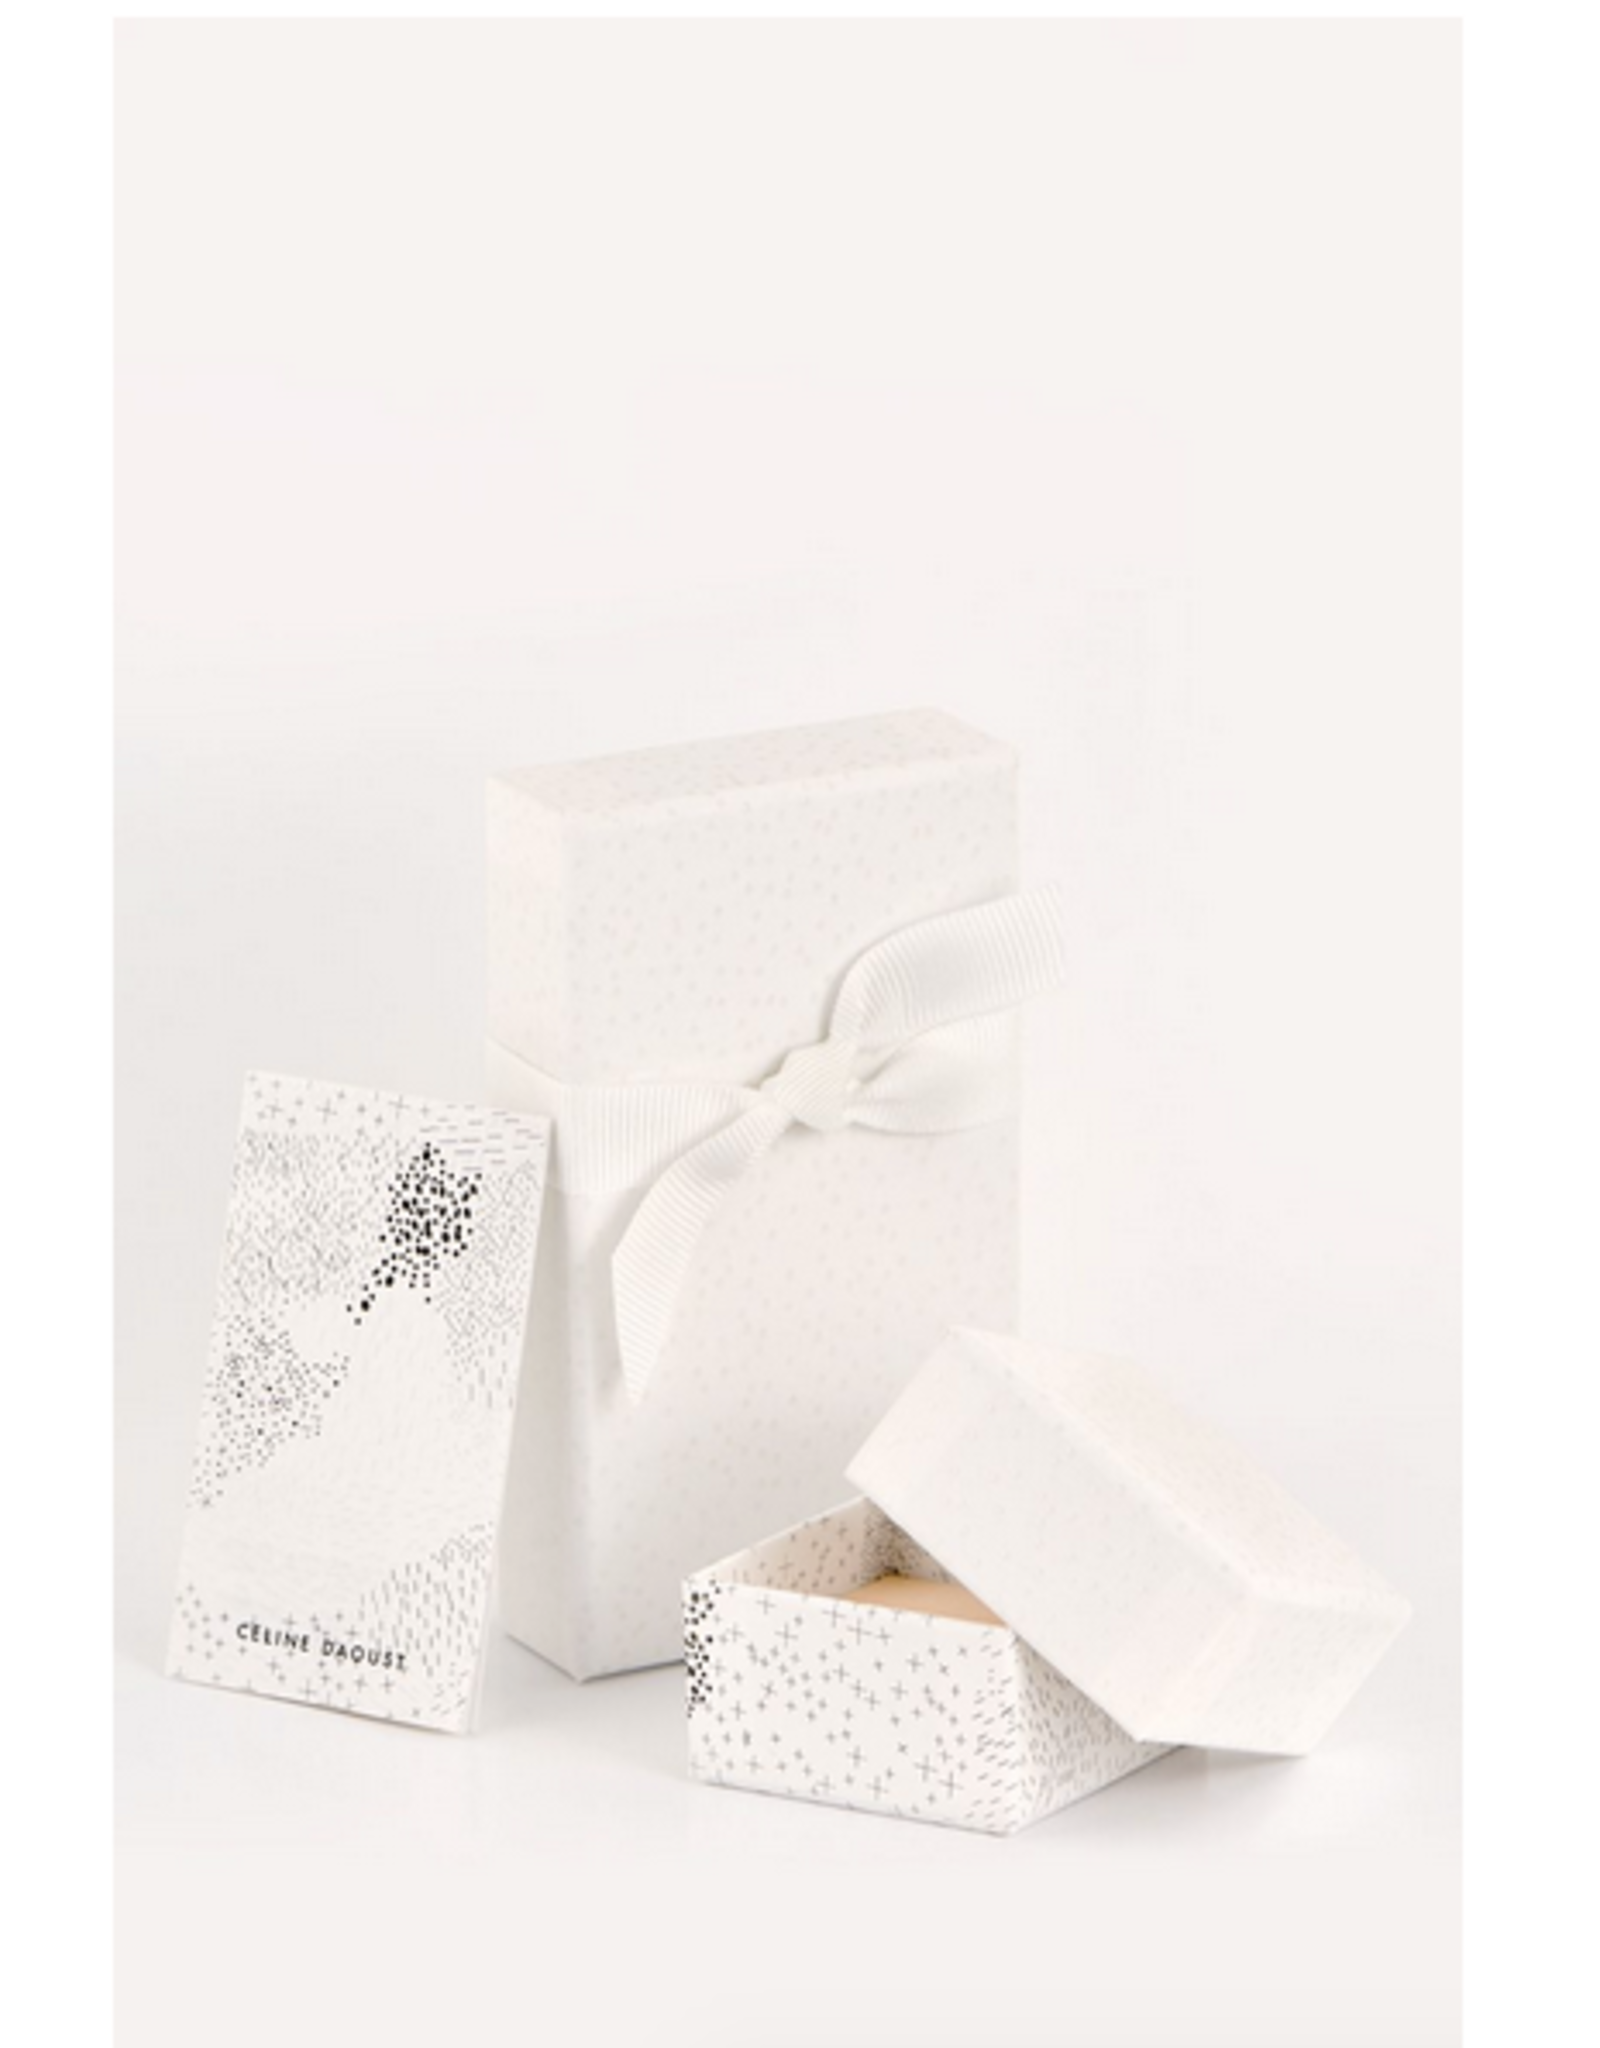 Celine Daoust Sun Beams Medallion Necklace - Marquise Pink Tourmaline + Diamonds